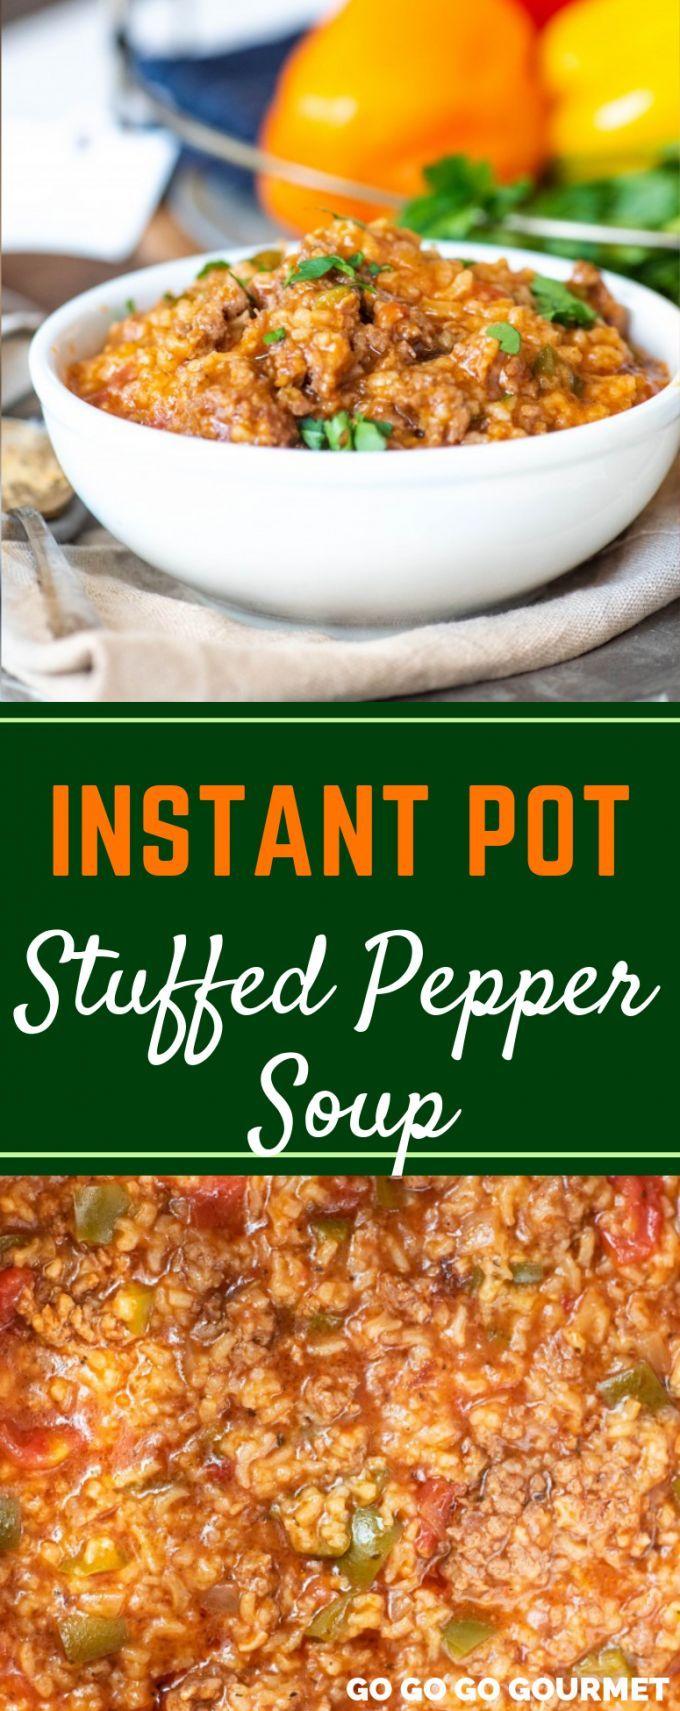 Stuffed Pepper Soup Instant Pot Stuffed Pepper Soup In 2020 Stuffed Pepper Soup Stuffed Peppers Skinny Taste Recipes